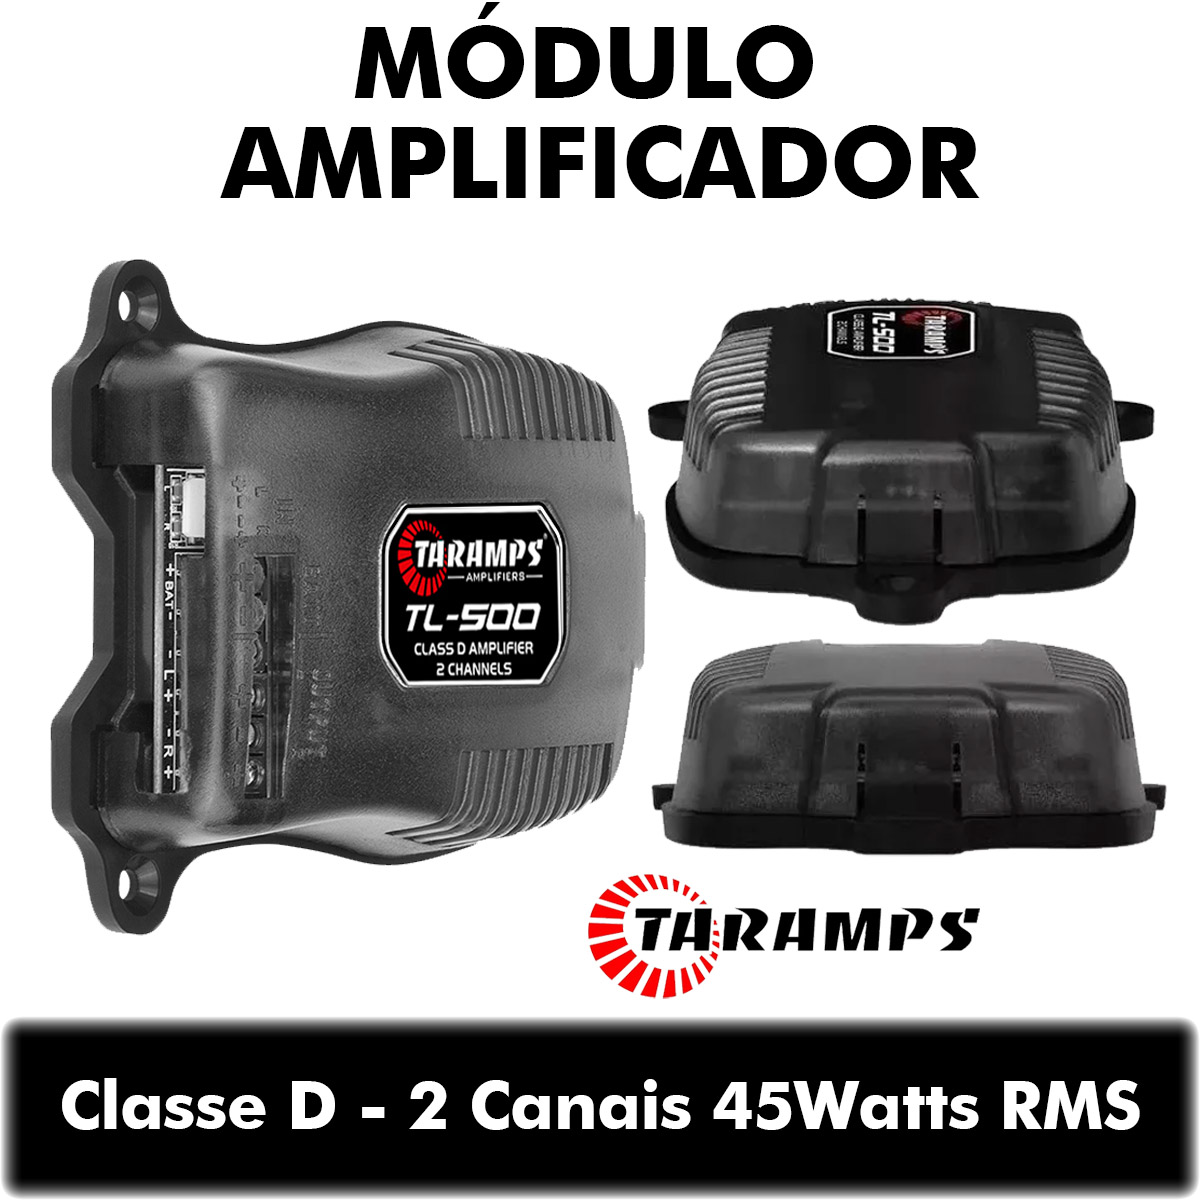 Amplificador Taramps TL-500 90Watts RMS Som Automotivo Poliparts